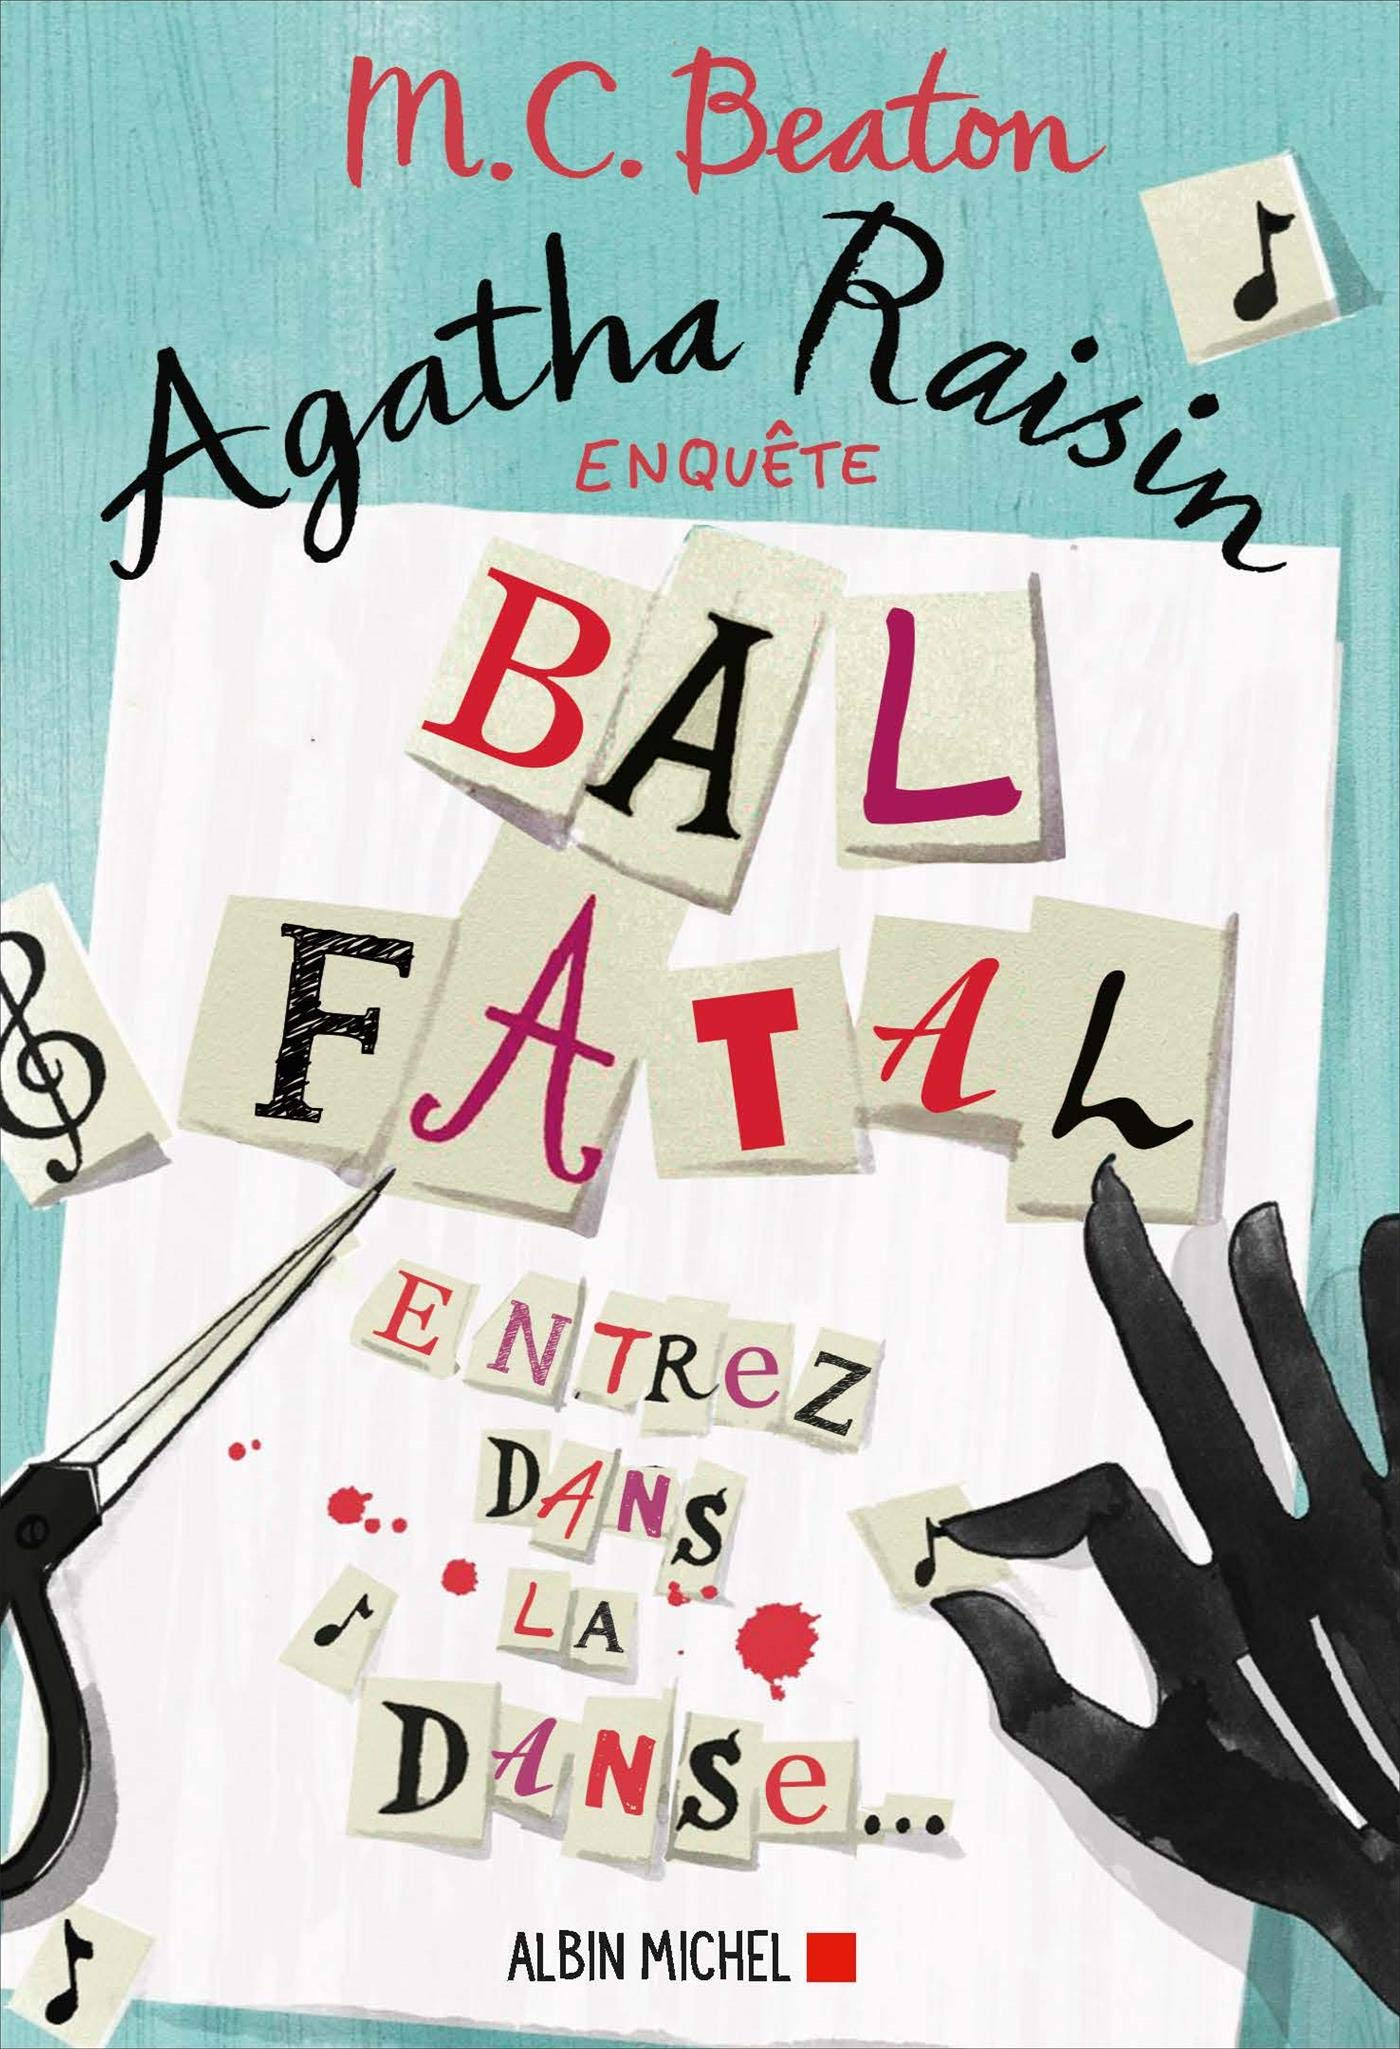 Agatha Raisin enquête 15 - Bal fatal: Entrez dans la danse...